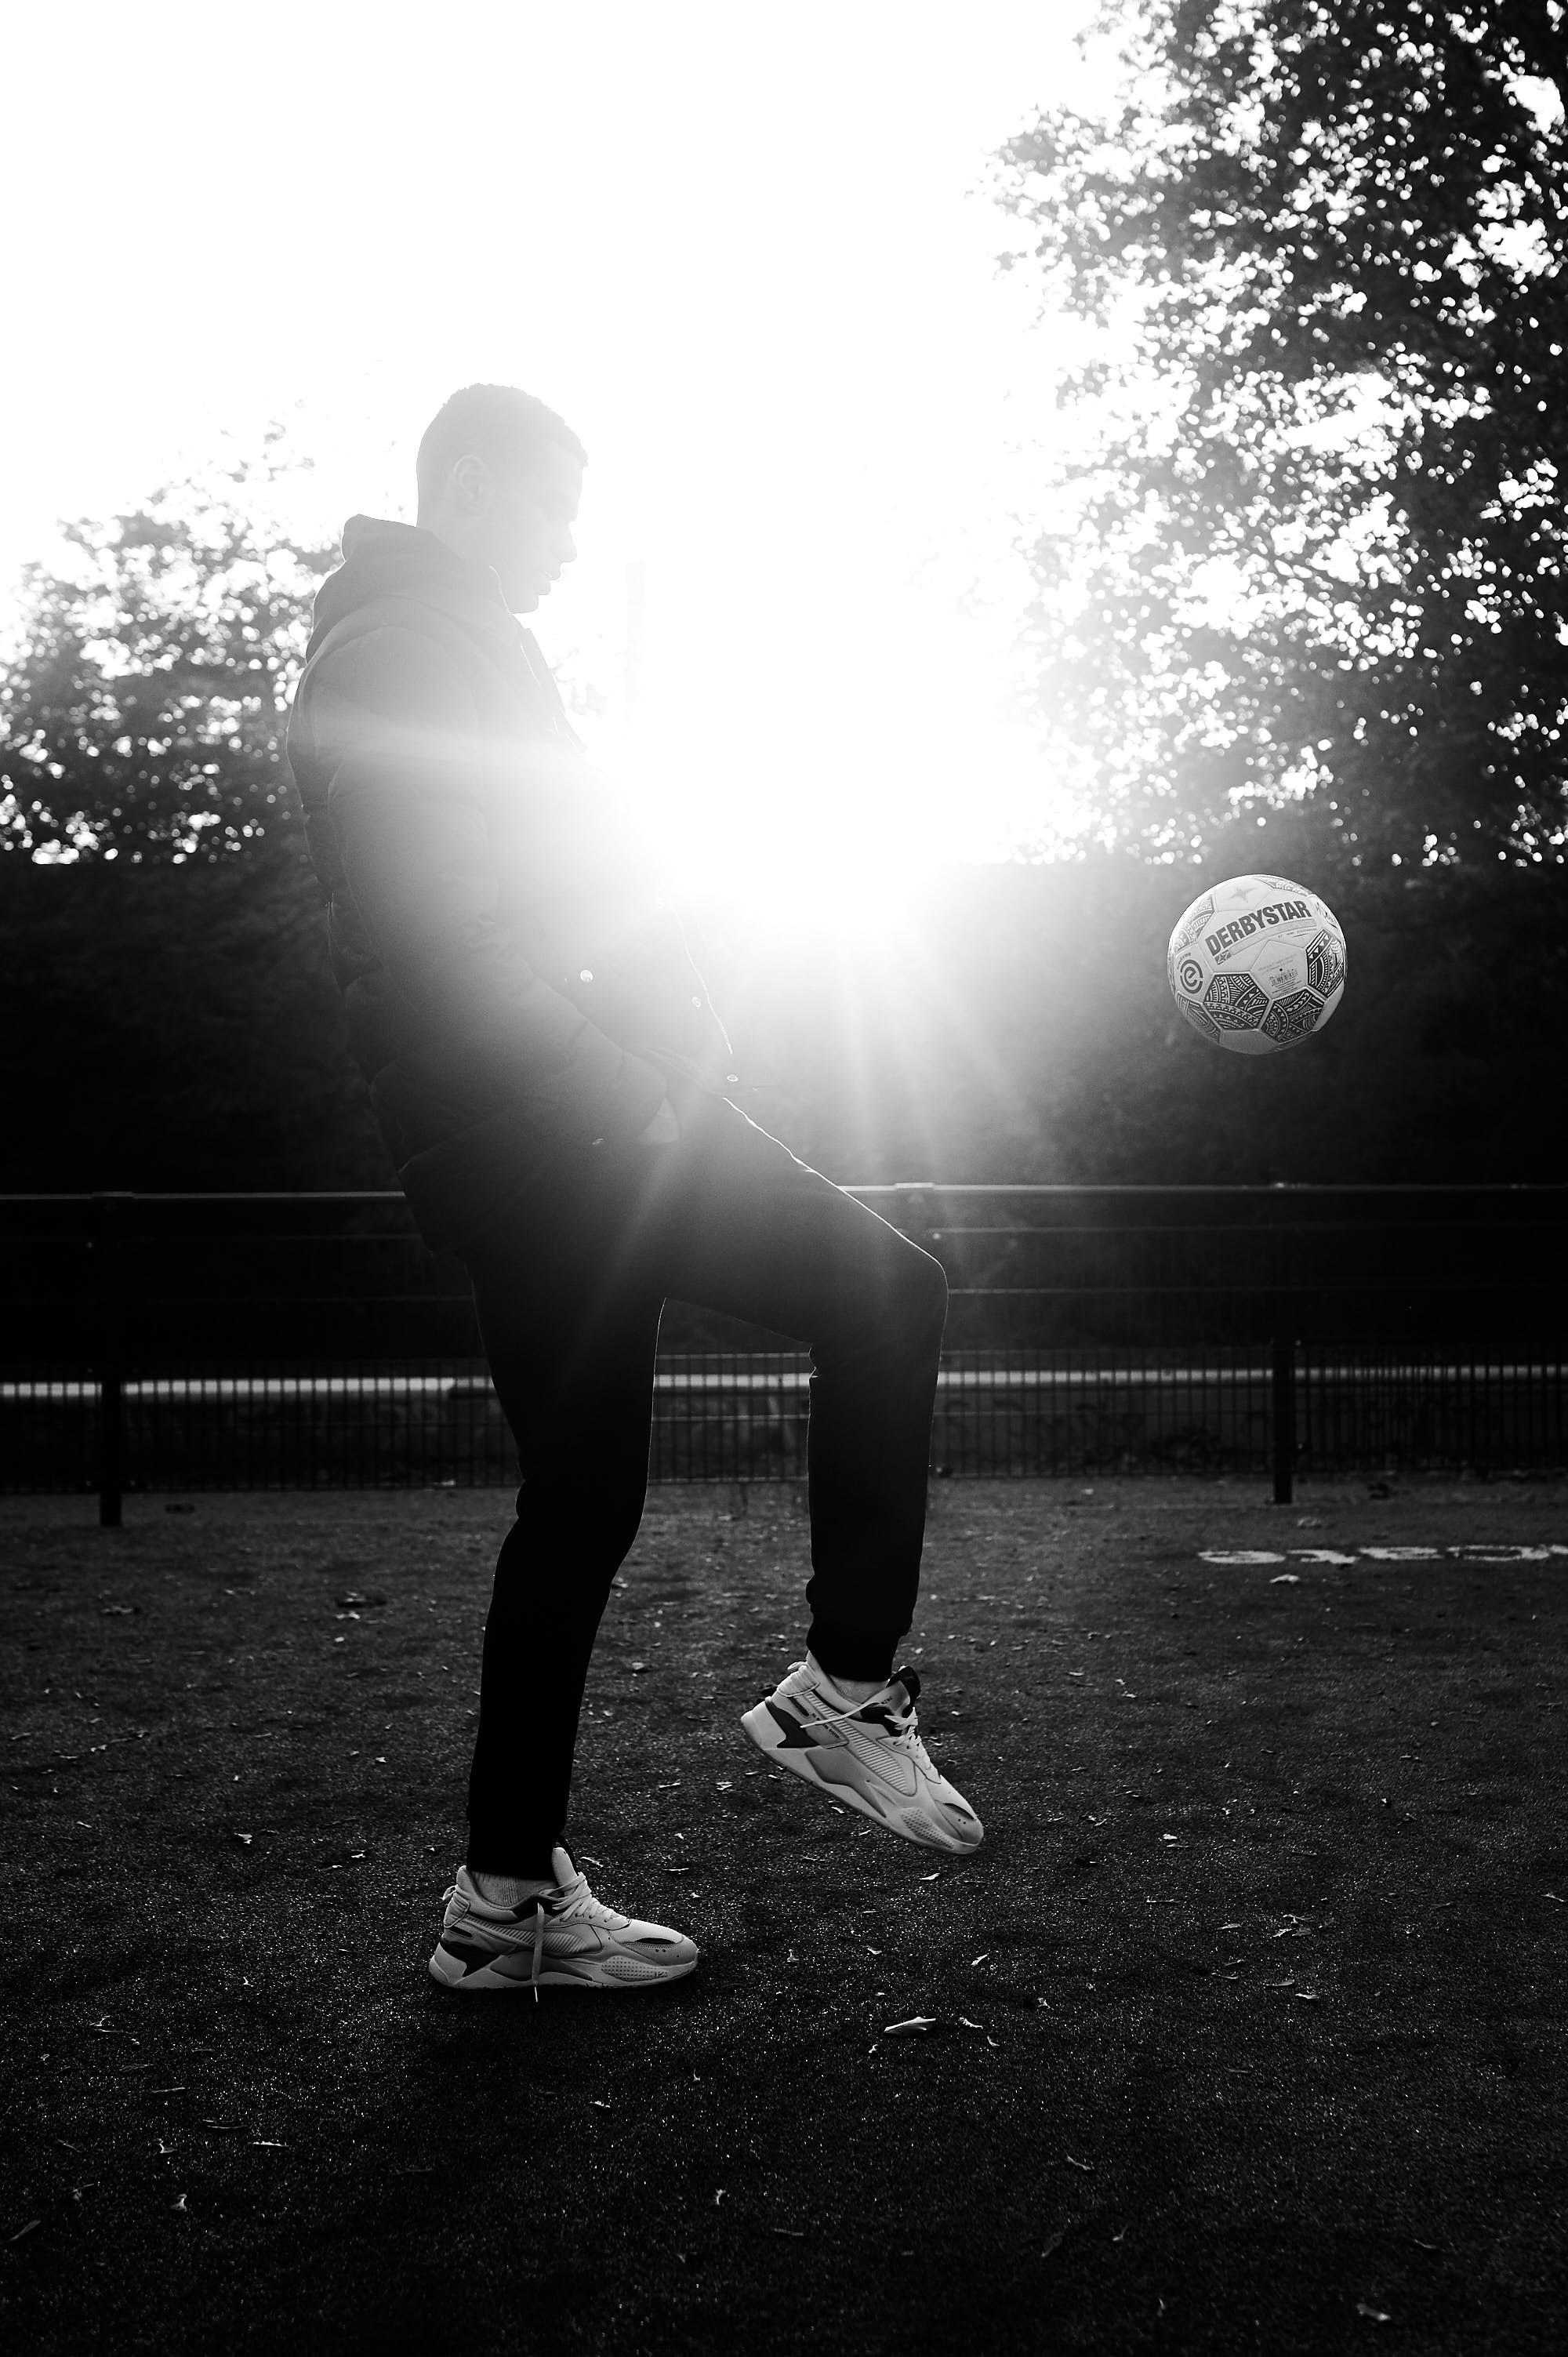 PSV Eindhoven winger Cody Gakpo